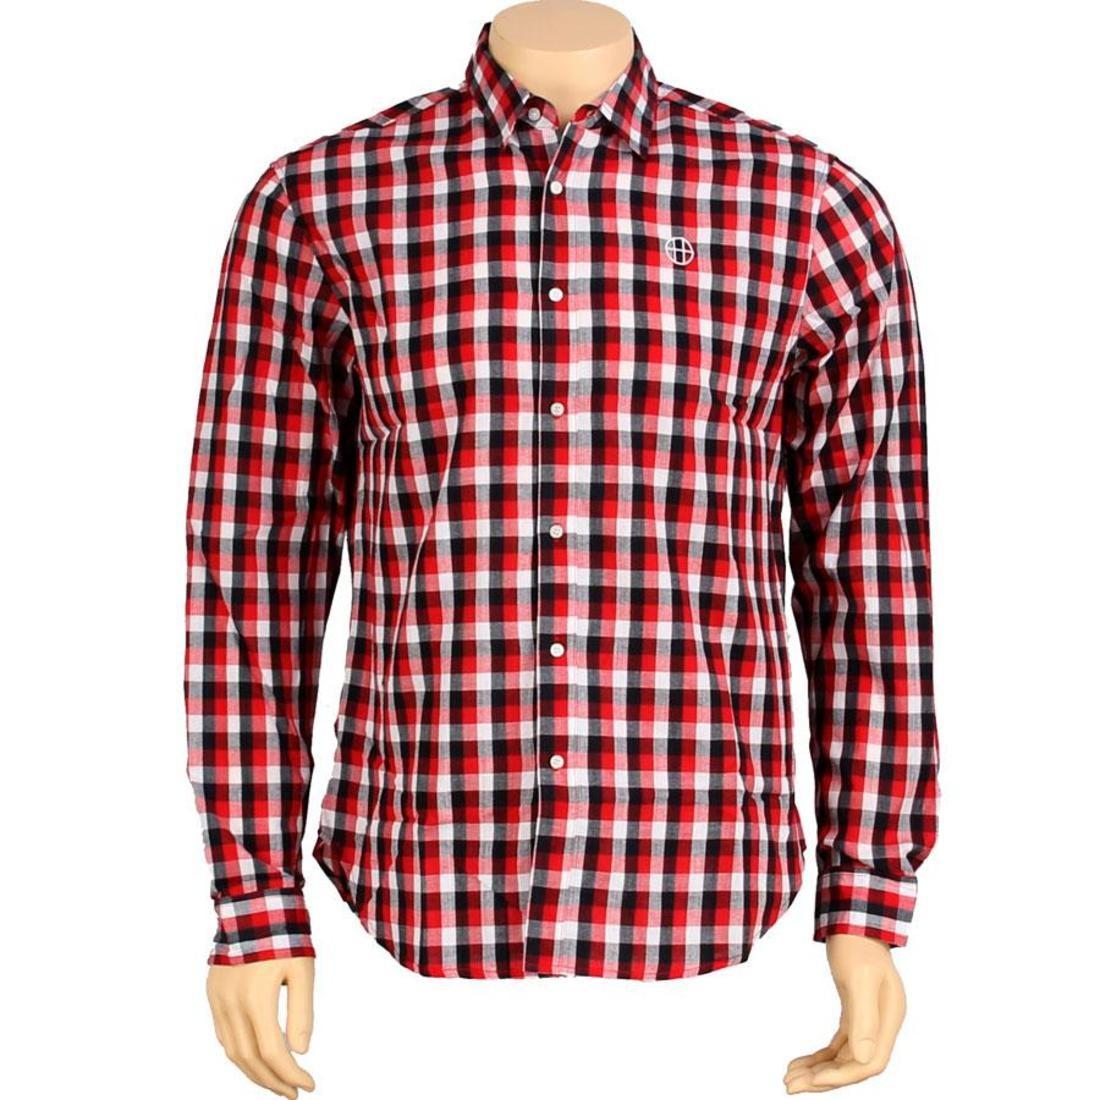 HUF ハフ 赤 レッド 【 HUF RED FT MILEY SHIRT 】 メンズファッション トップス カジュアルシャツ